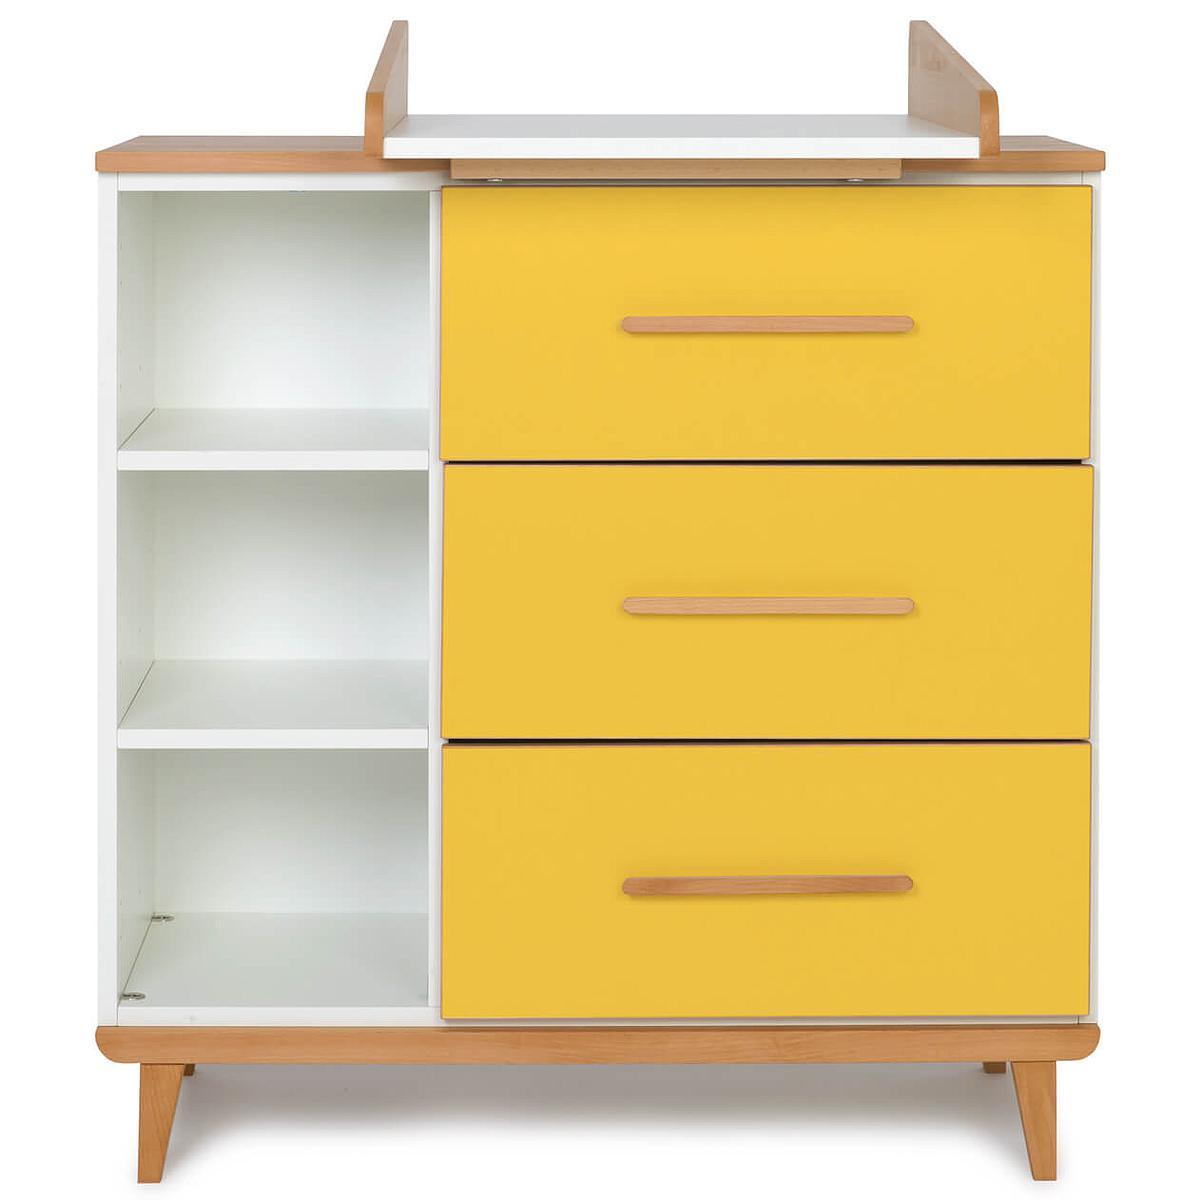 Wookids - Commode à langer 3 tiroirs NADO yellow